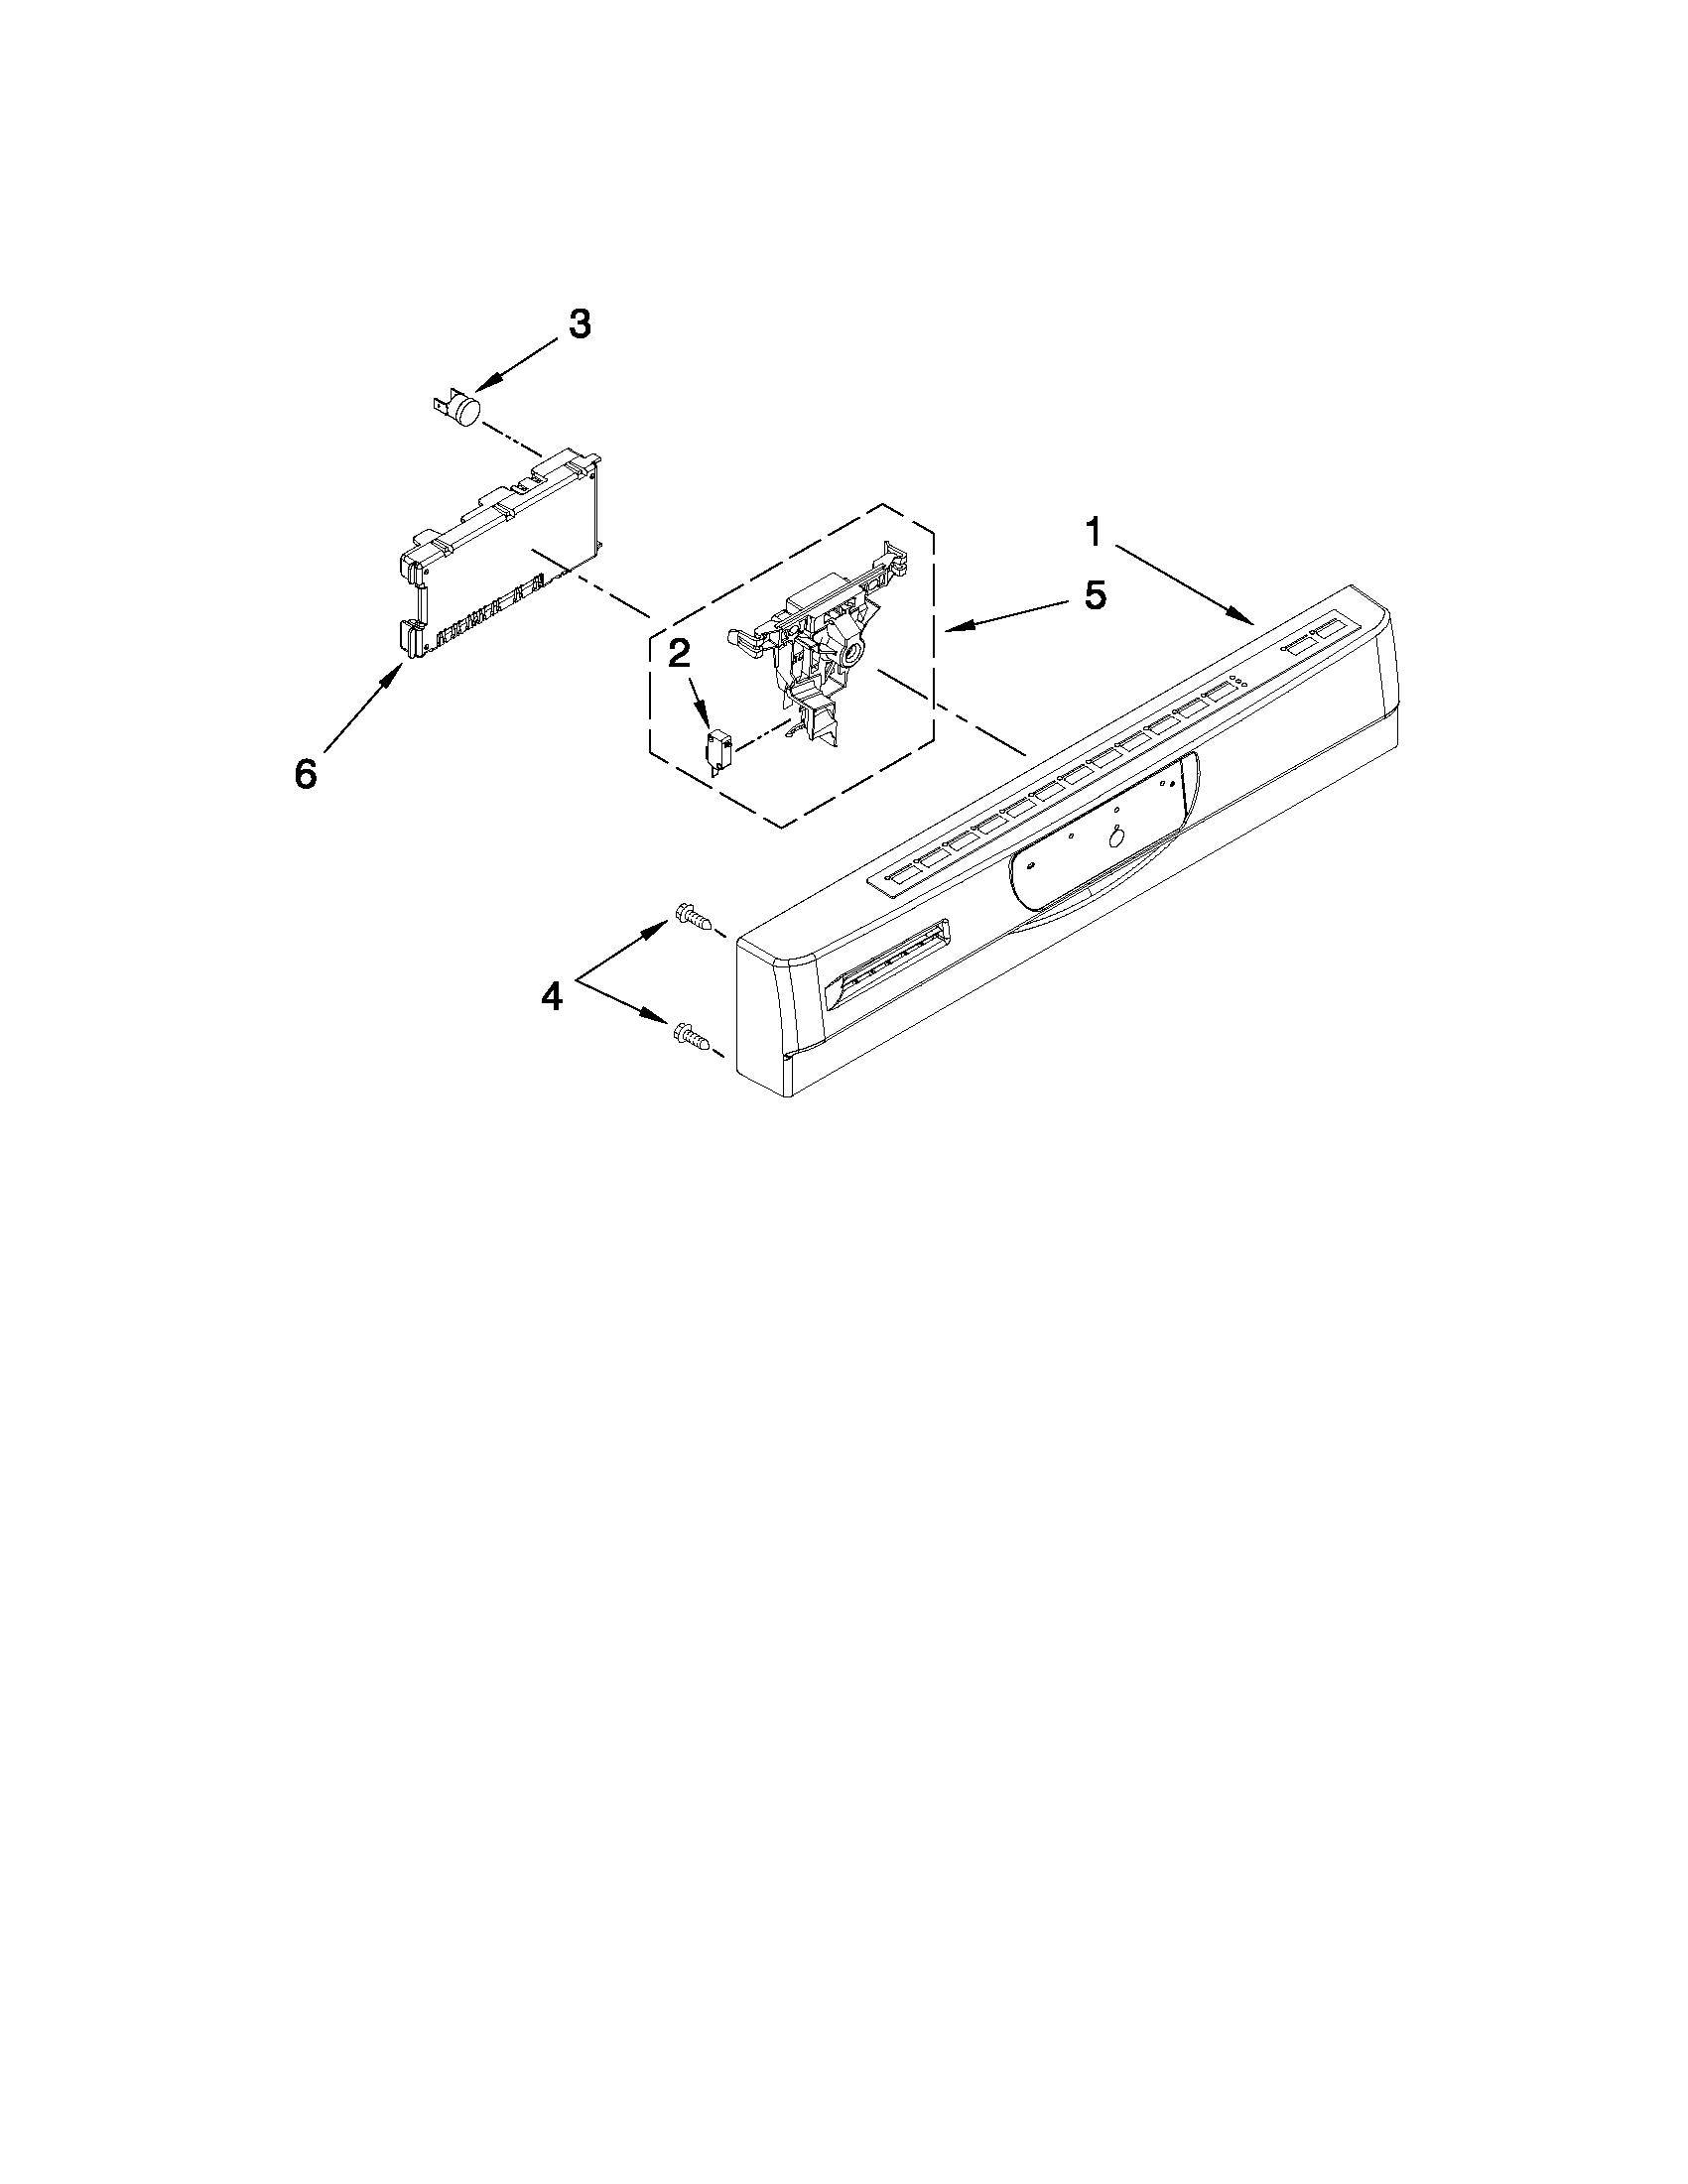 Jenn Air Model Jdb3200aws5 Dishwasher Genuine Parts Computer Diagram